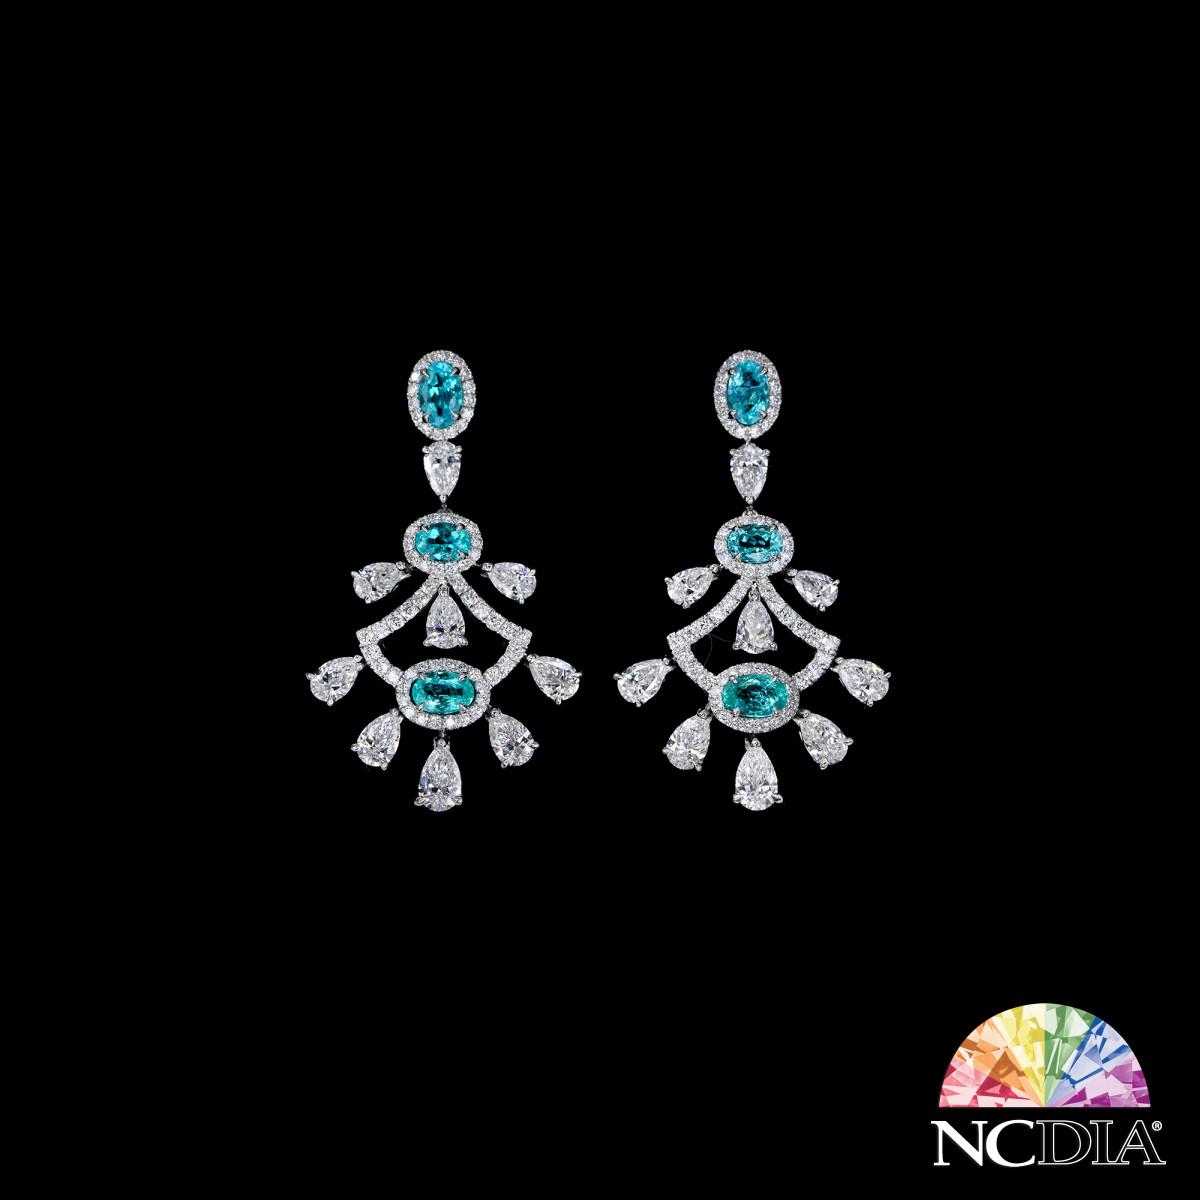 Brazilian Paraiba Diamond Earrings, GRS certs ava.